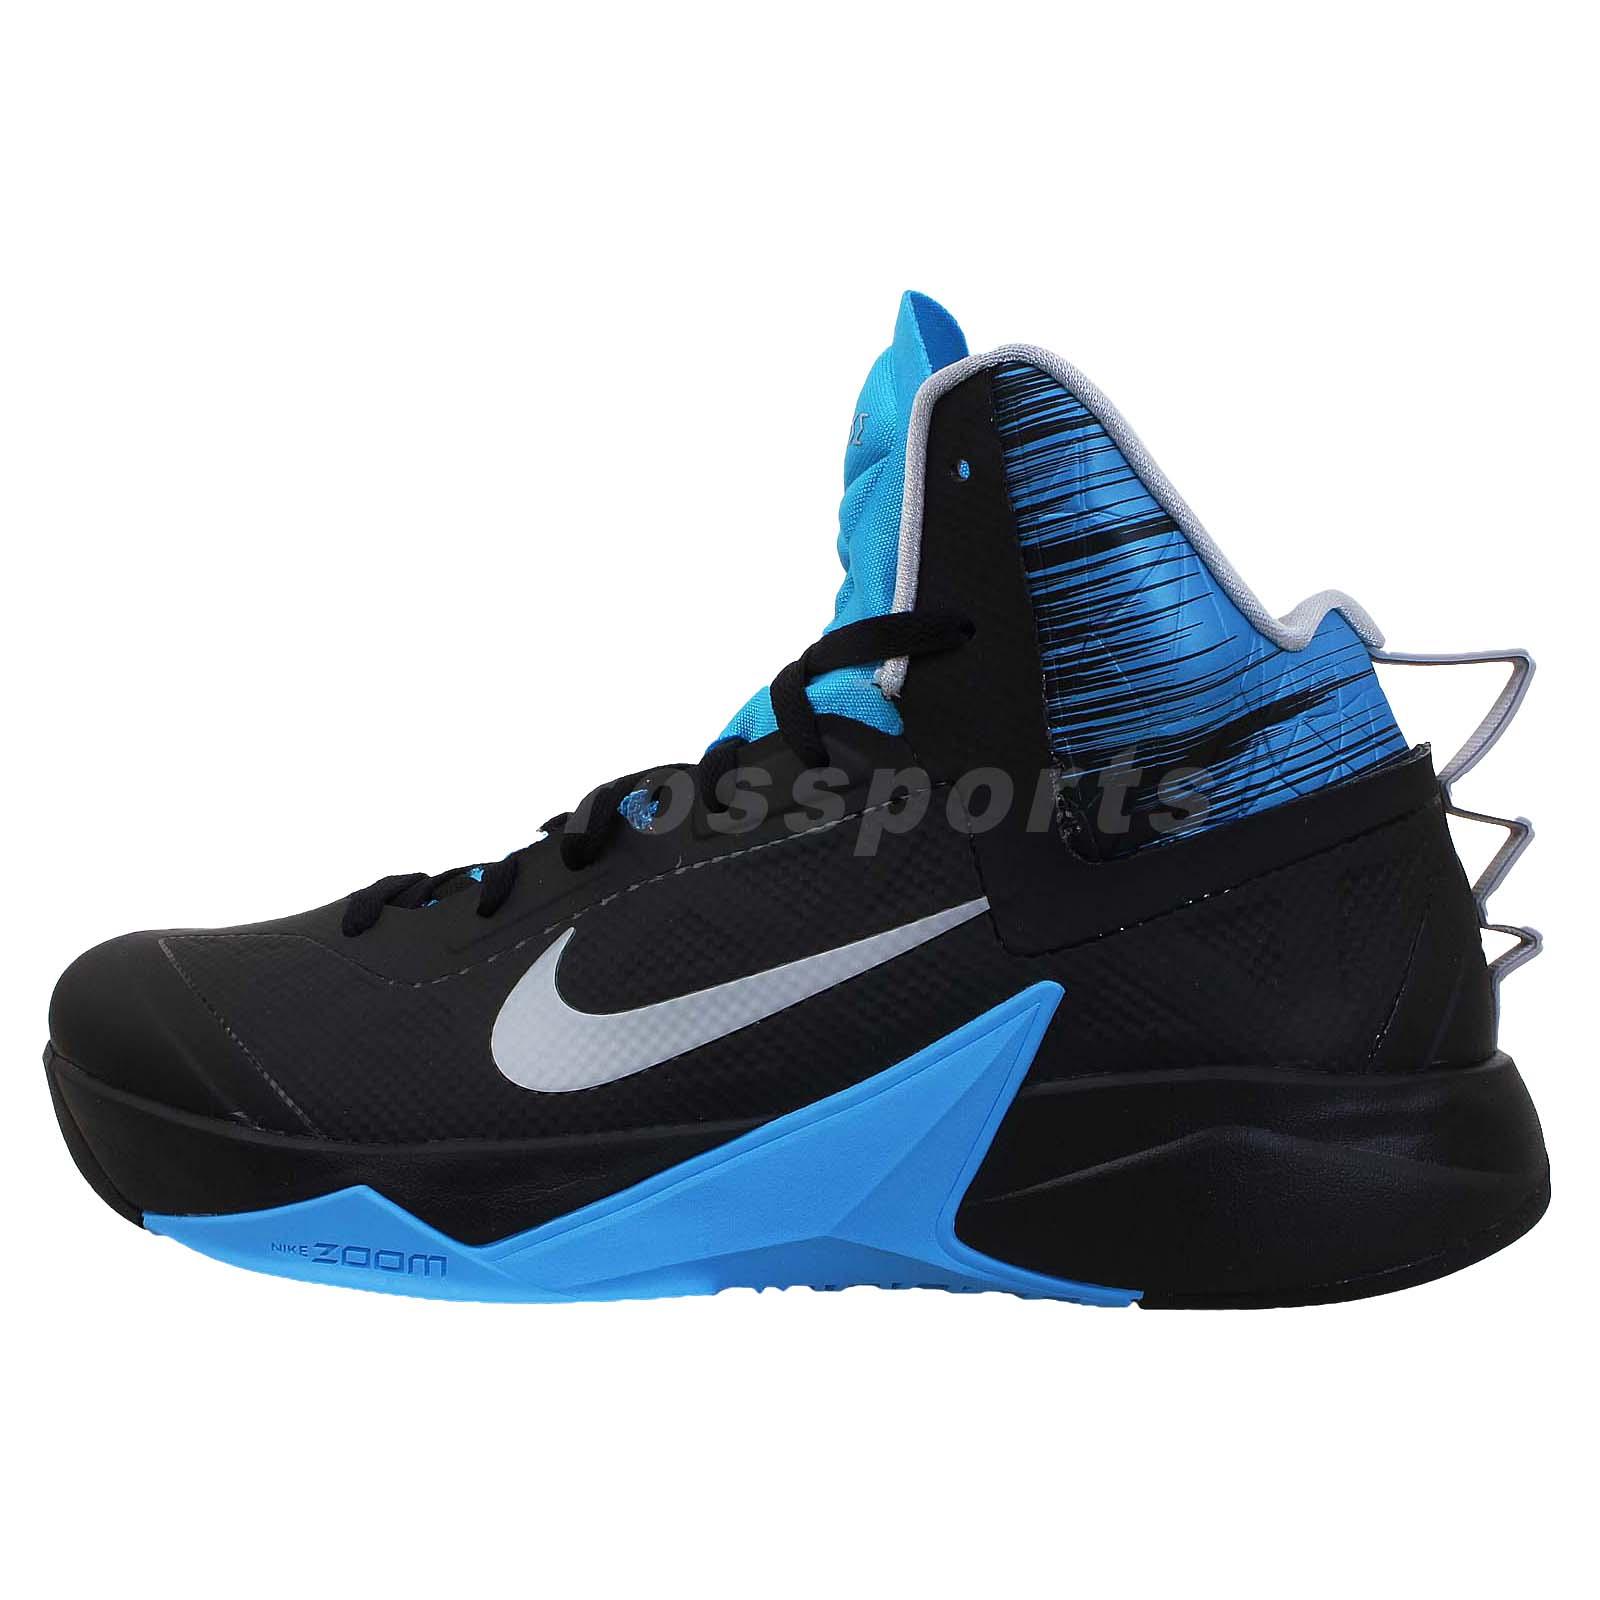 nike zoom hyperfuse 2013 xdr black blue mens basketball